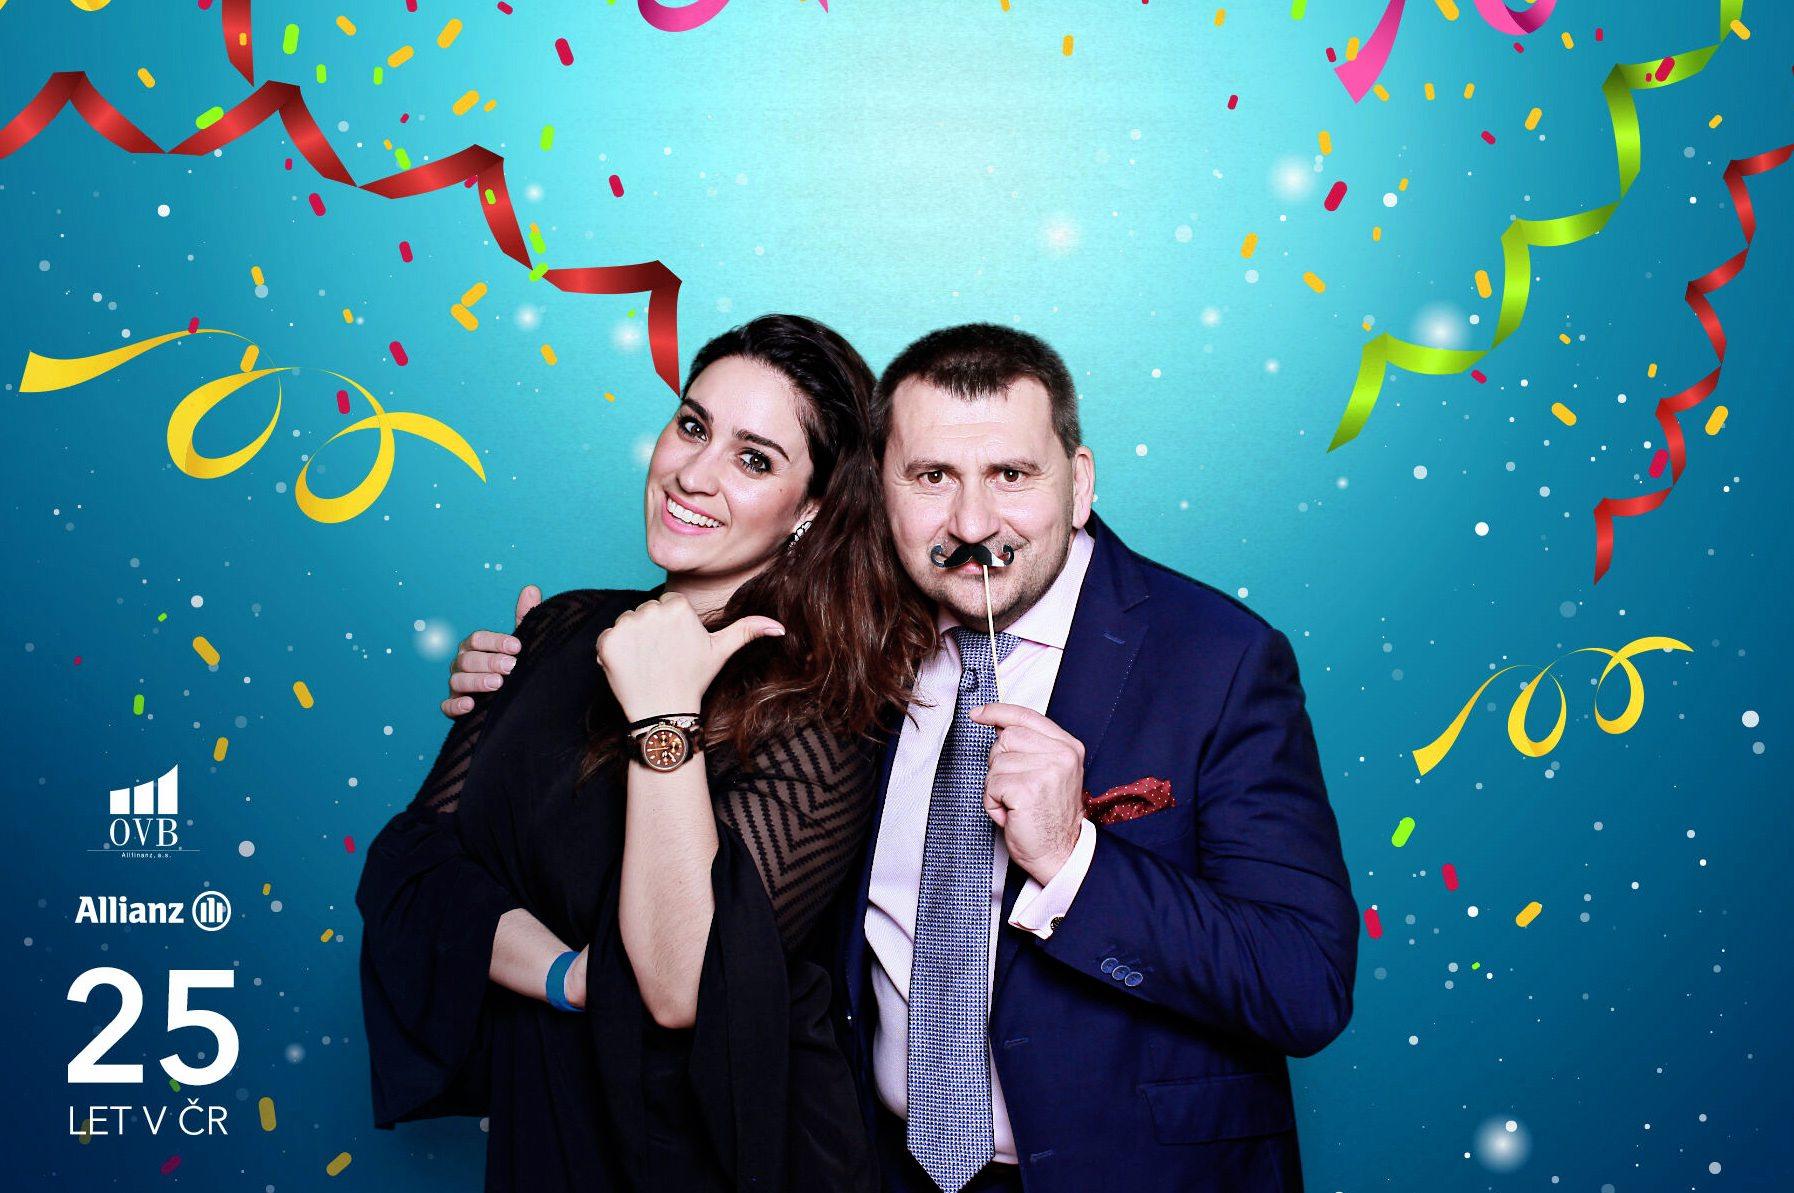 fotokoutek-allianz-ovb-13-3-2018-401033